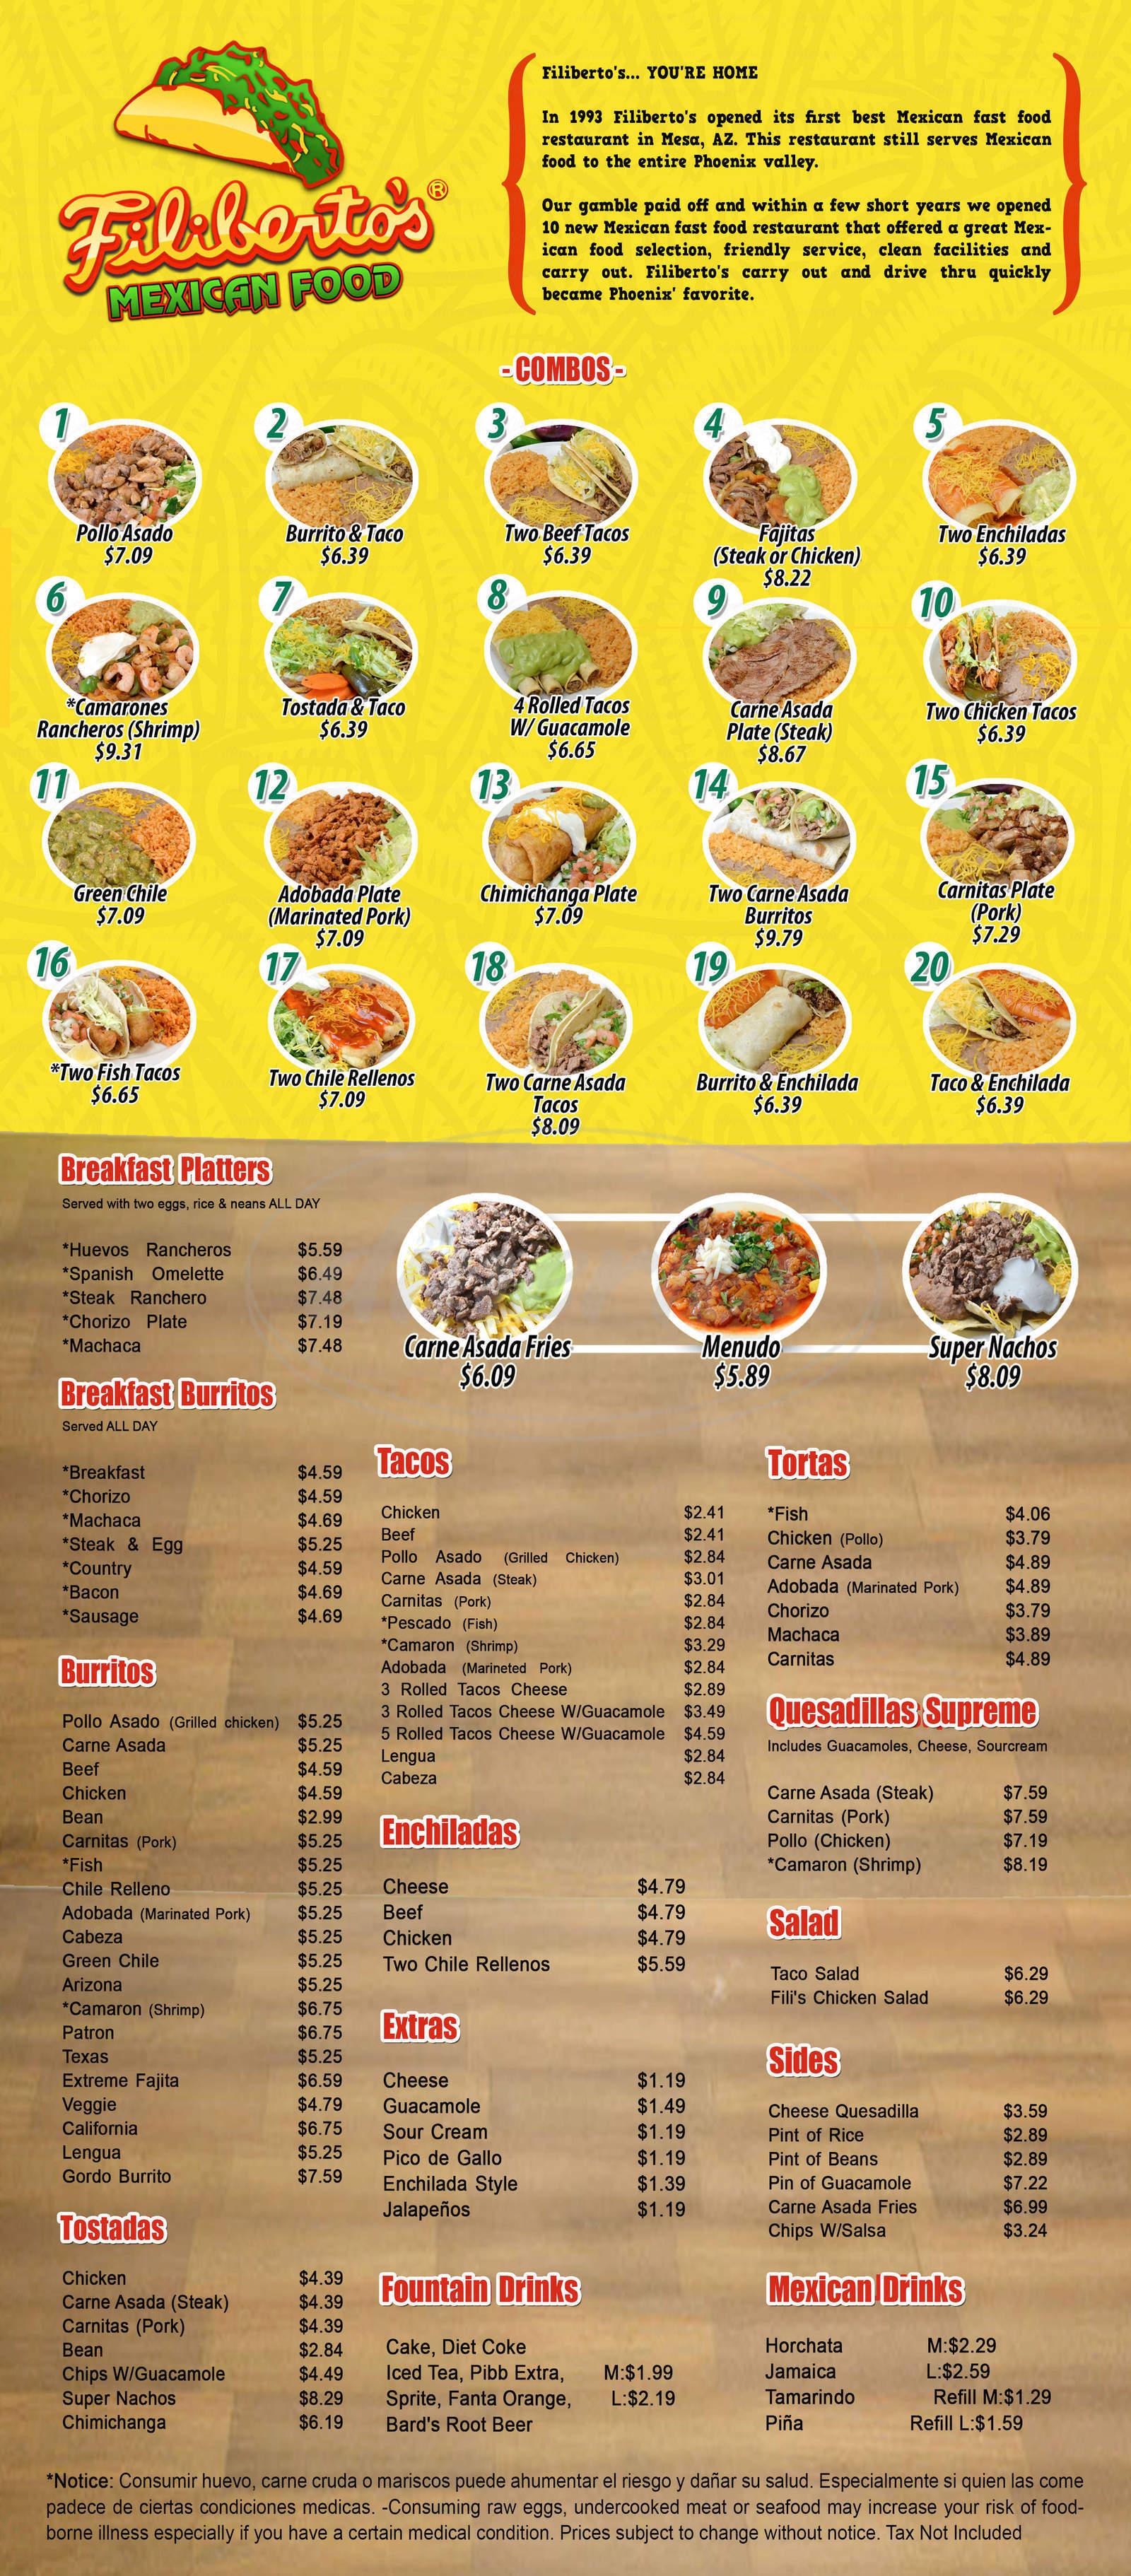 menu for Filiberto's Mexican Food